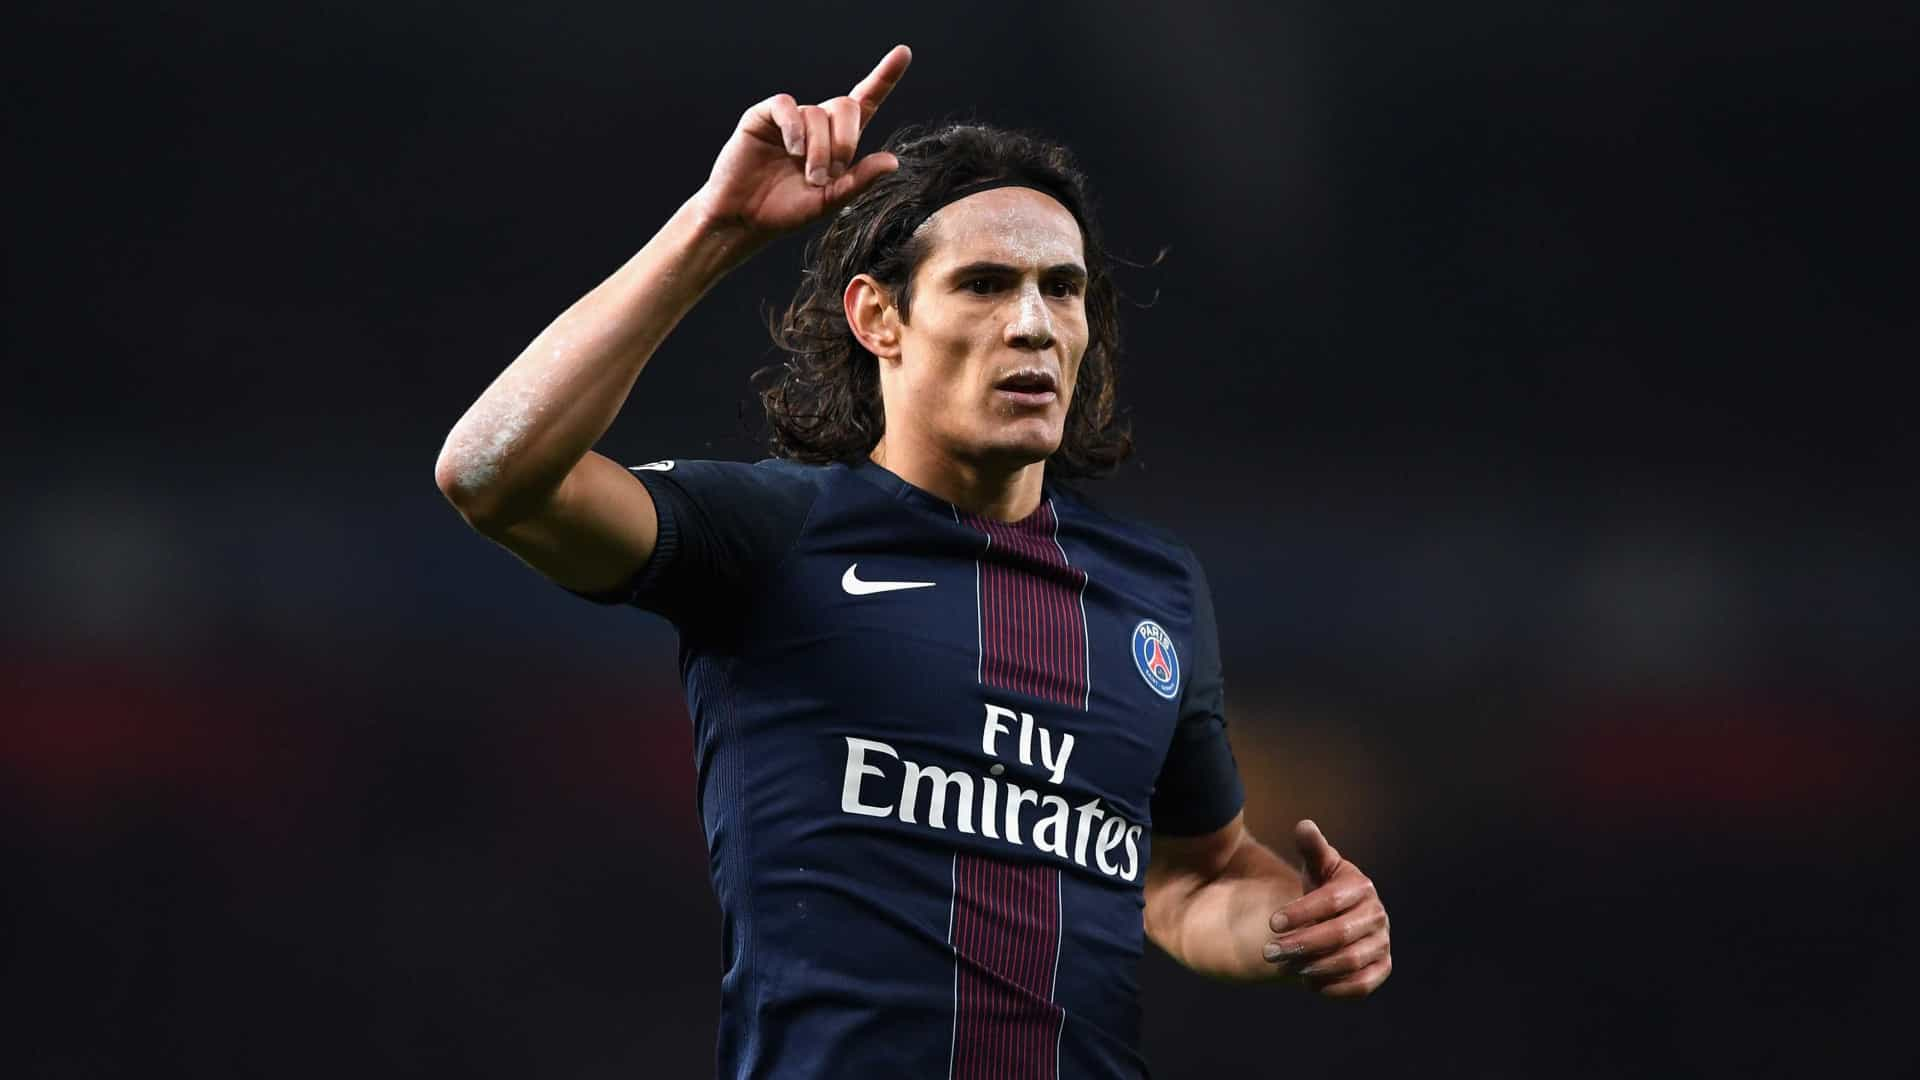 Cavani terá acordo para renovar com o Paris Saint-Germain